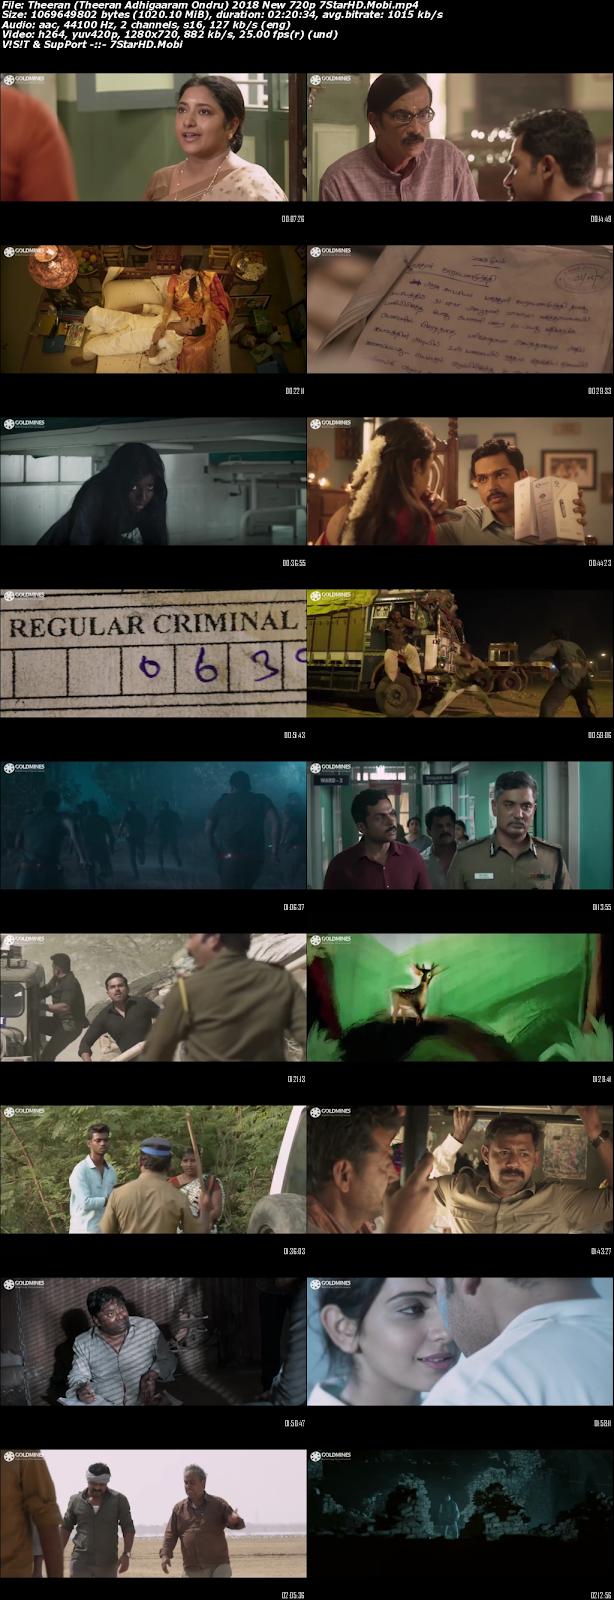 Theeran (Theeran Adhigaaram Ondru) 2018 Hindi Dubbed 720p HDRip x264 1GB 2